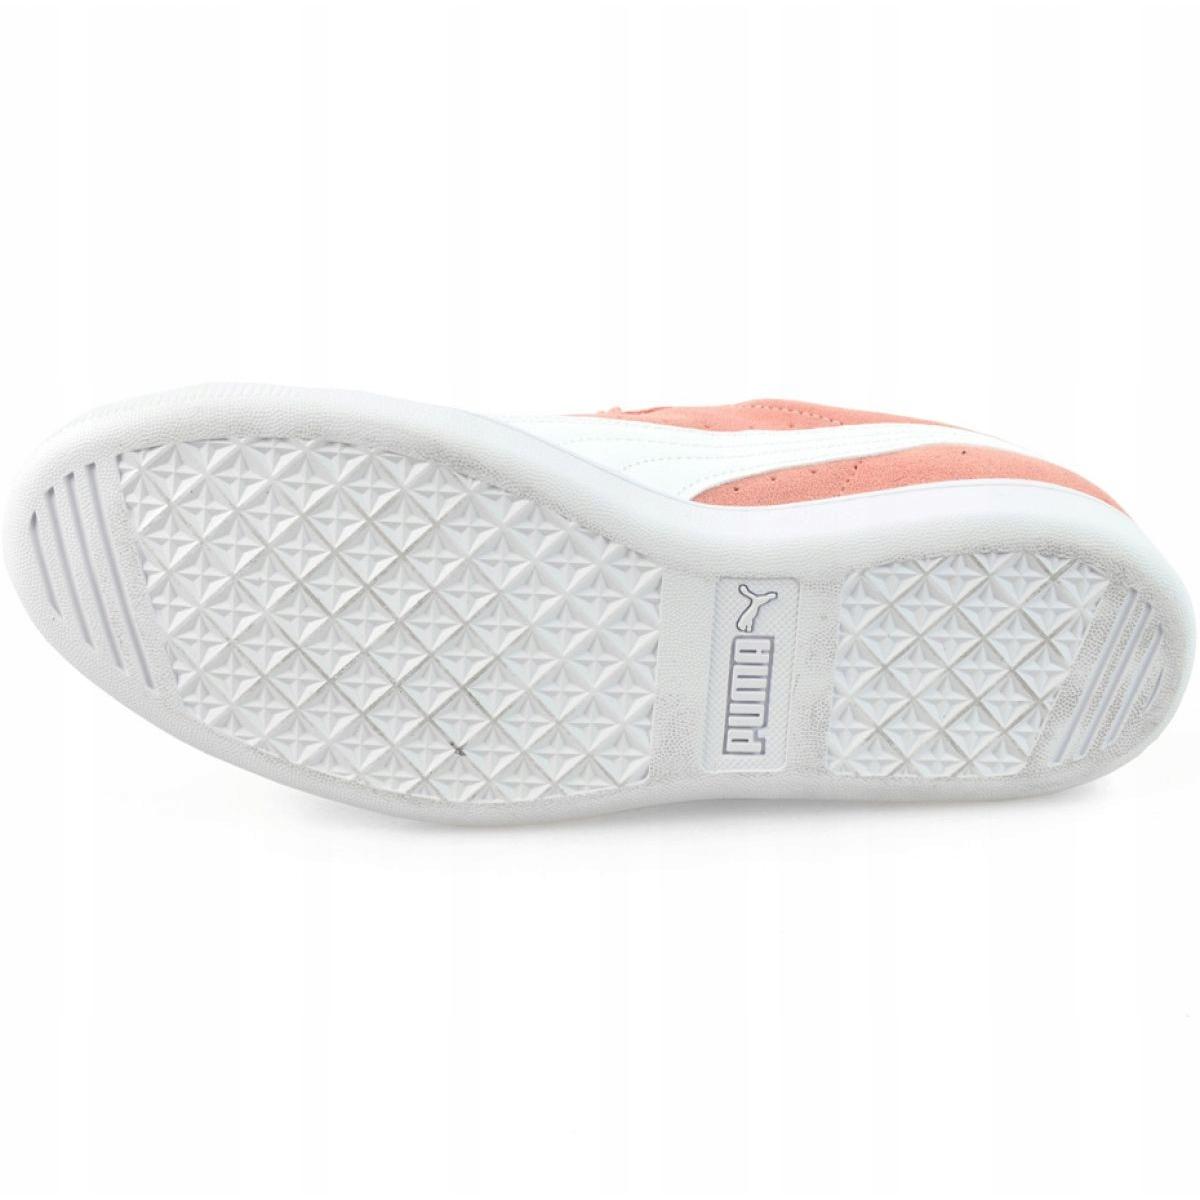 Details about Pink Shoes Puma Vikky Peach Beige Puma White W 362624 25